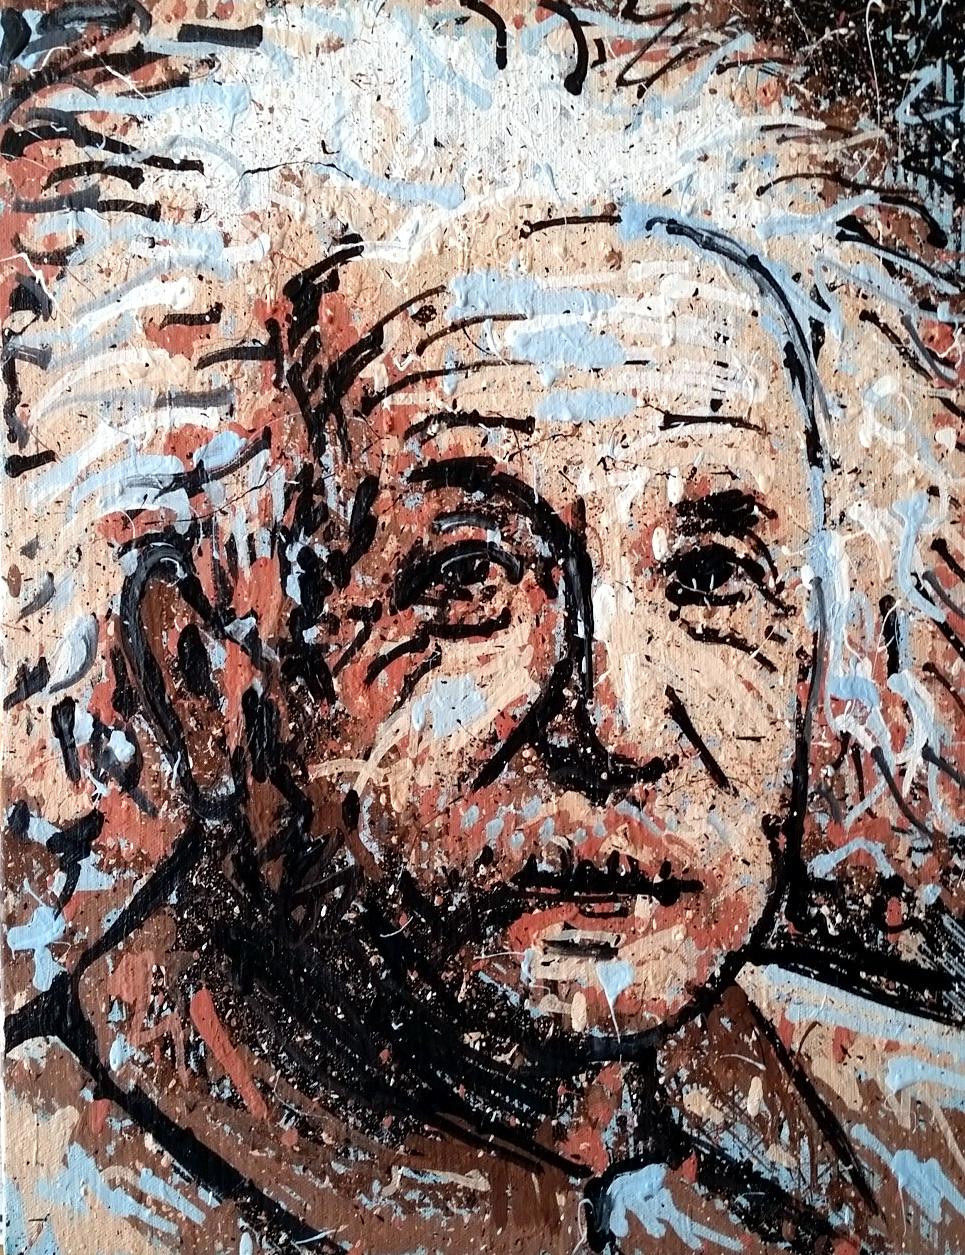 GeorgeWashingtonUniversity_cloudPainter_PindarVanArman_Einstein.jpg